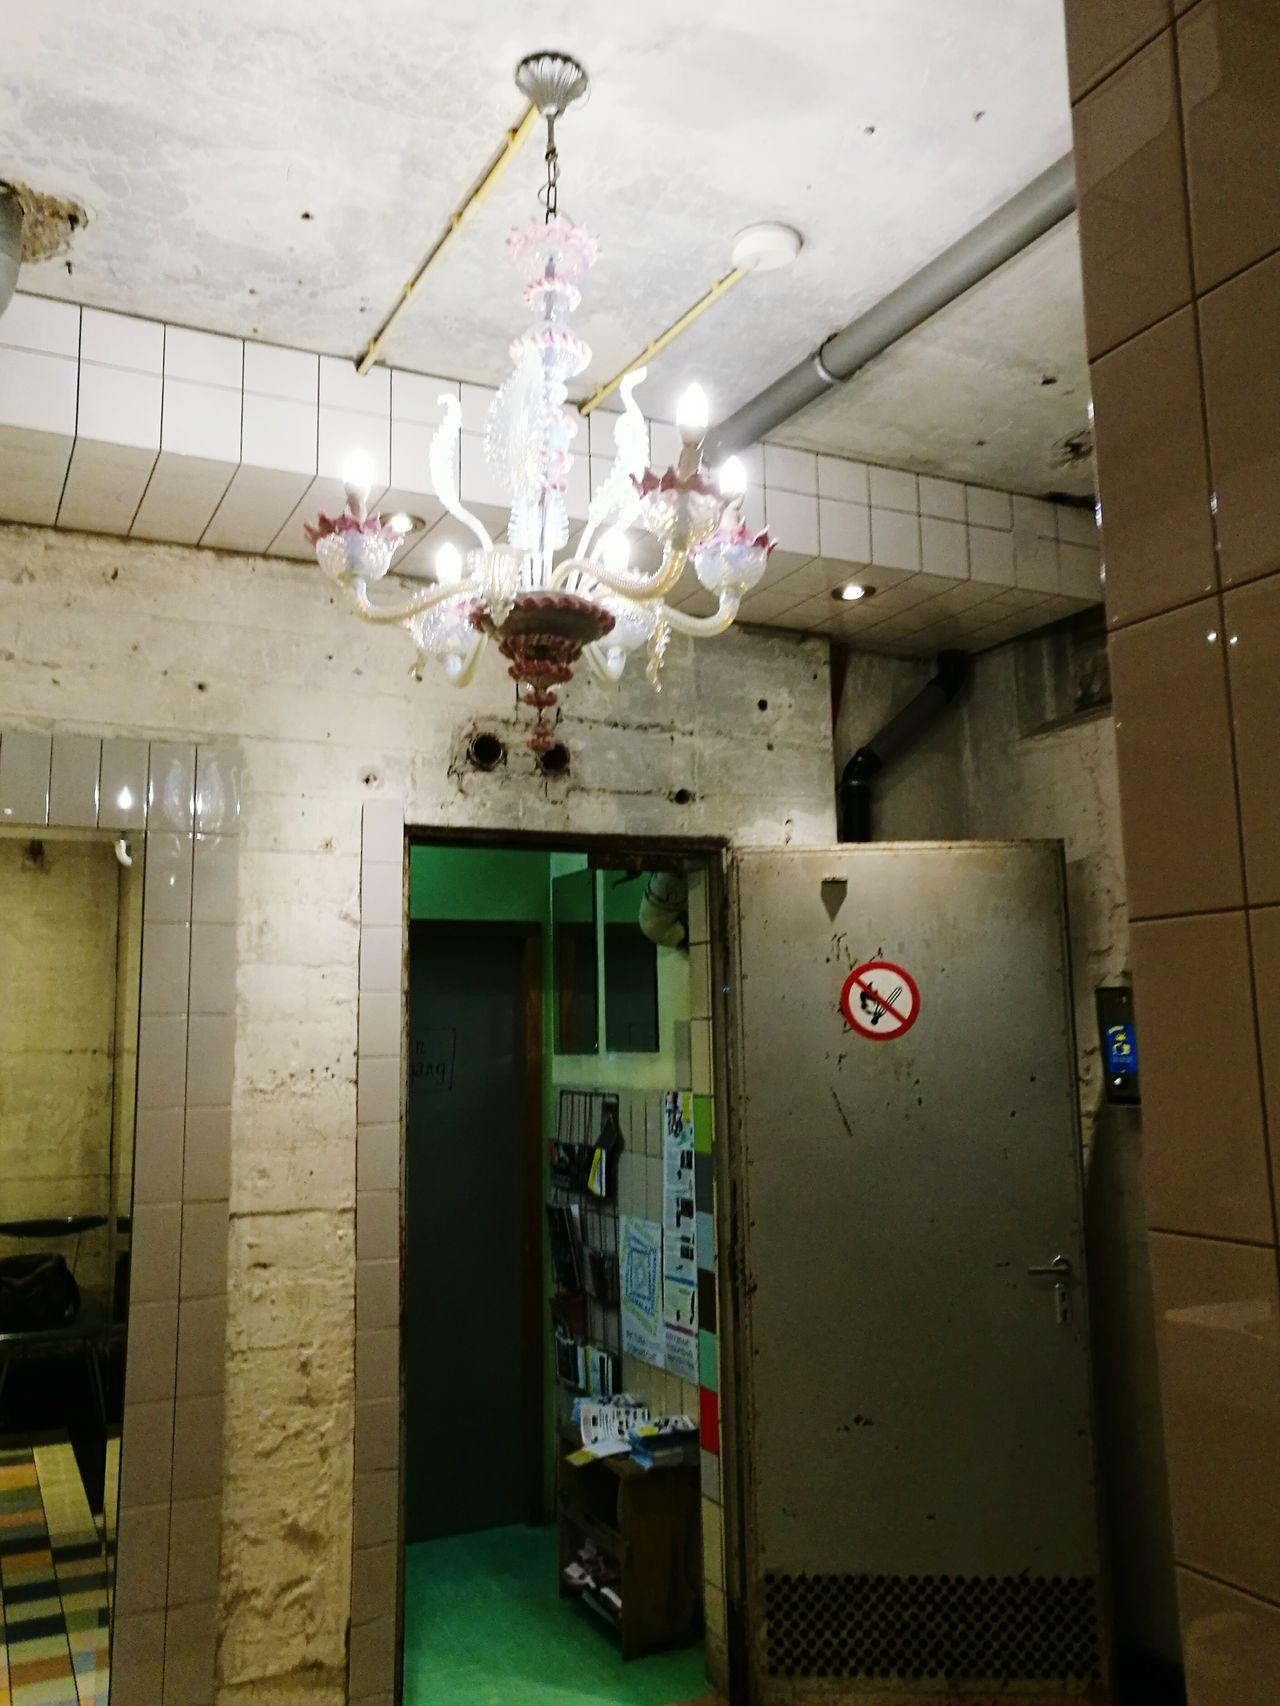 At the bathroom No People Entrance Architecture Indoors  Day Huawei P9 Plus Photography Made By Noesie Crown Lighther Heavy Door Bathroom Art Hall Bathroom Bathroom Items Decorations Indoor Mirror Art Is Everywhere EyeEmNewHere The Week On EyeEm